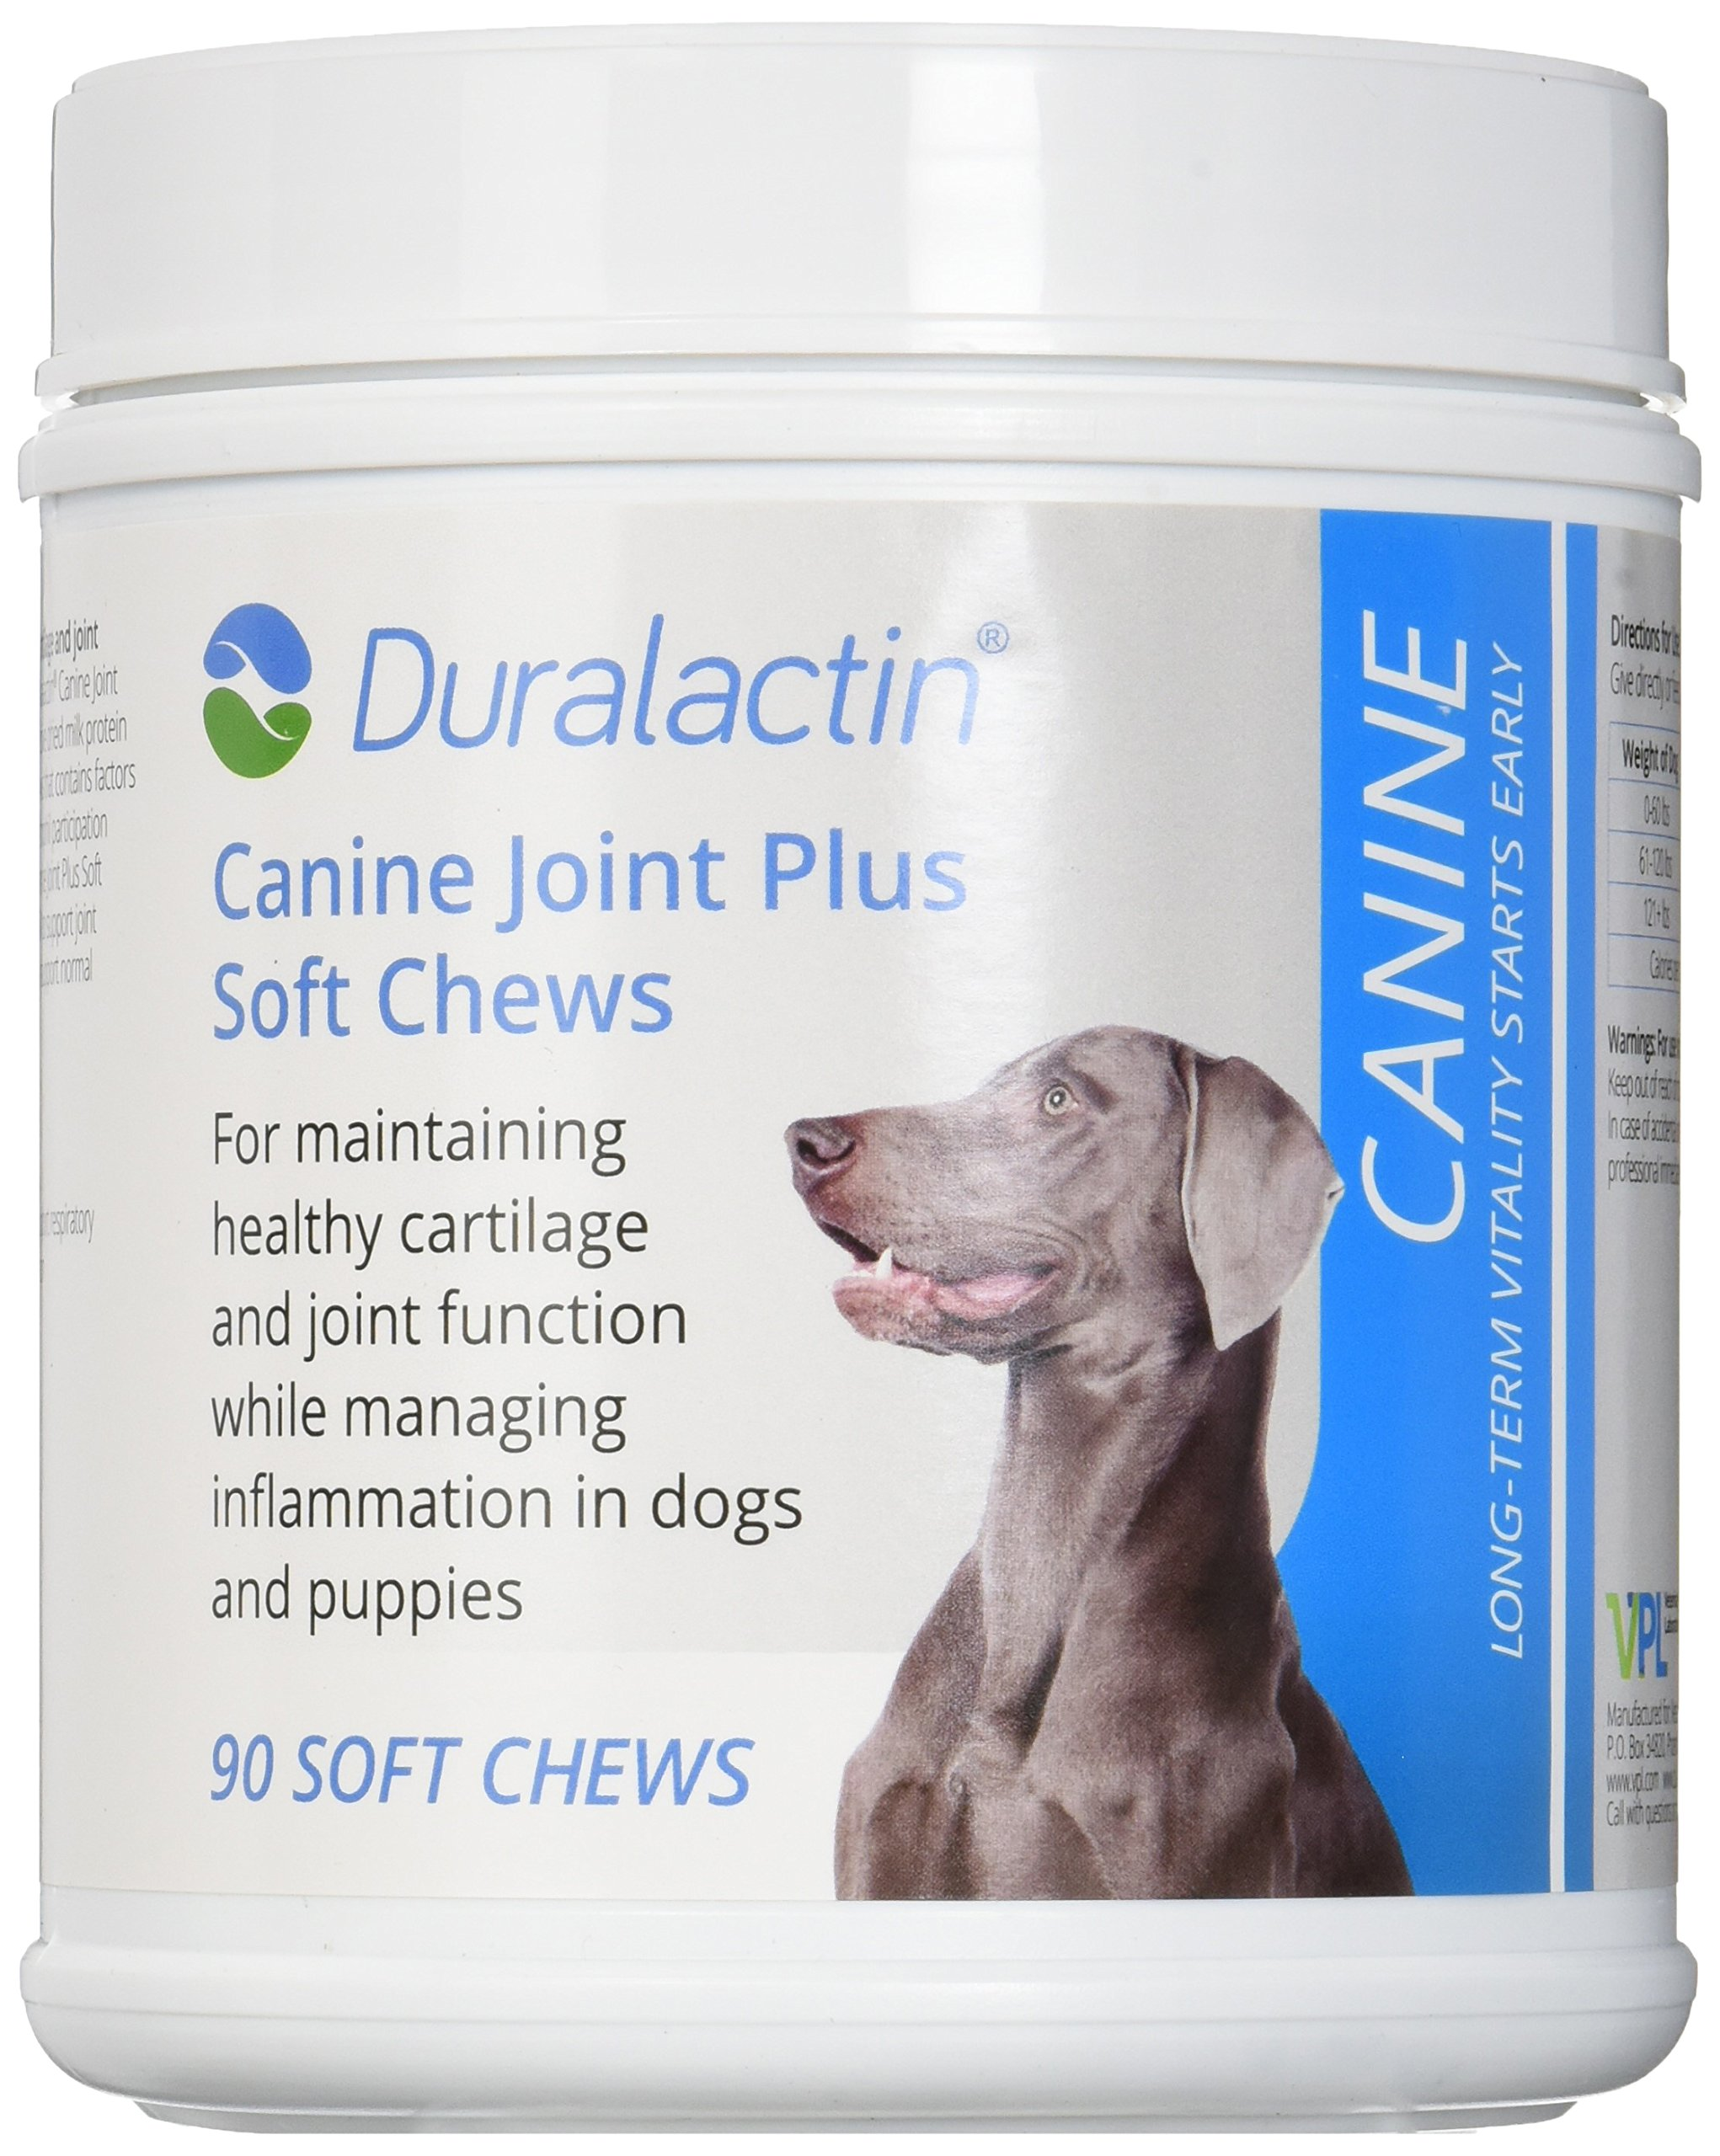 Duralactin Canine Joint Plus Soft Chews Triple Strength - 90 Soft Chews by VPL